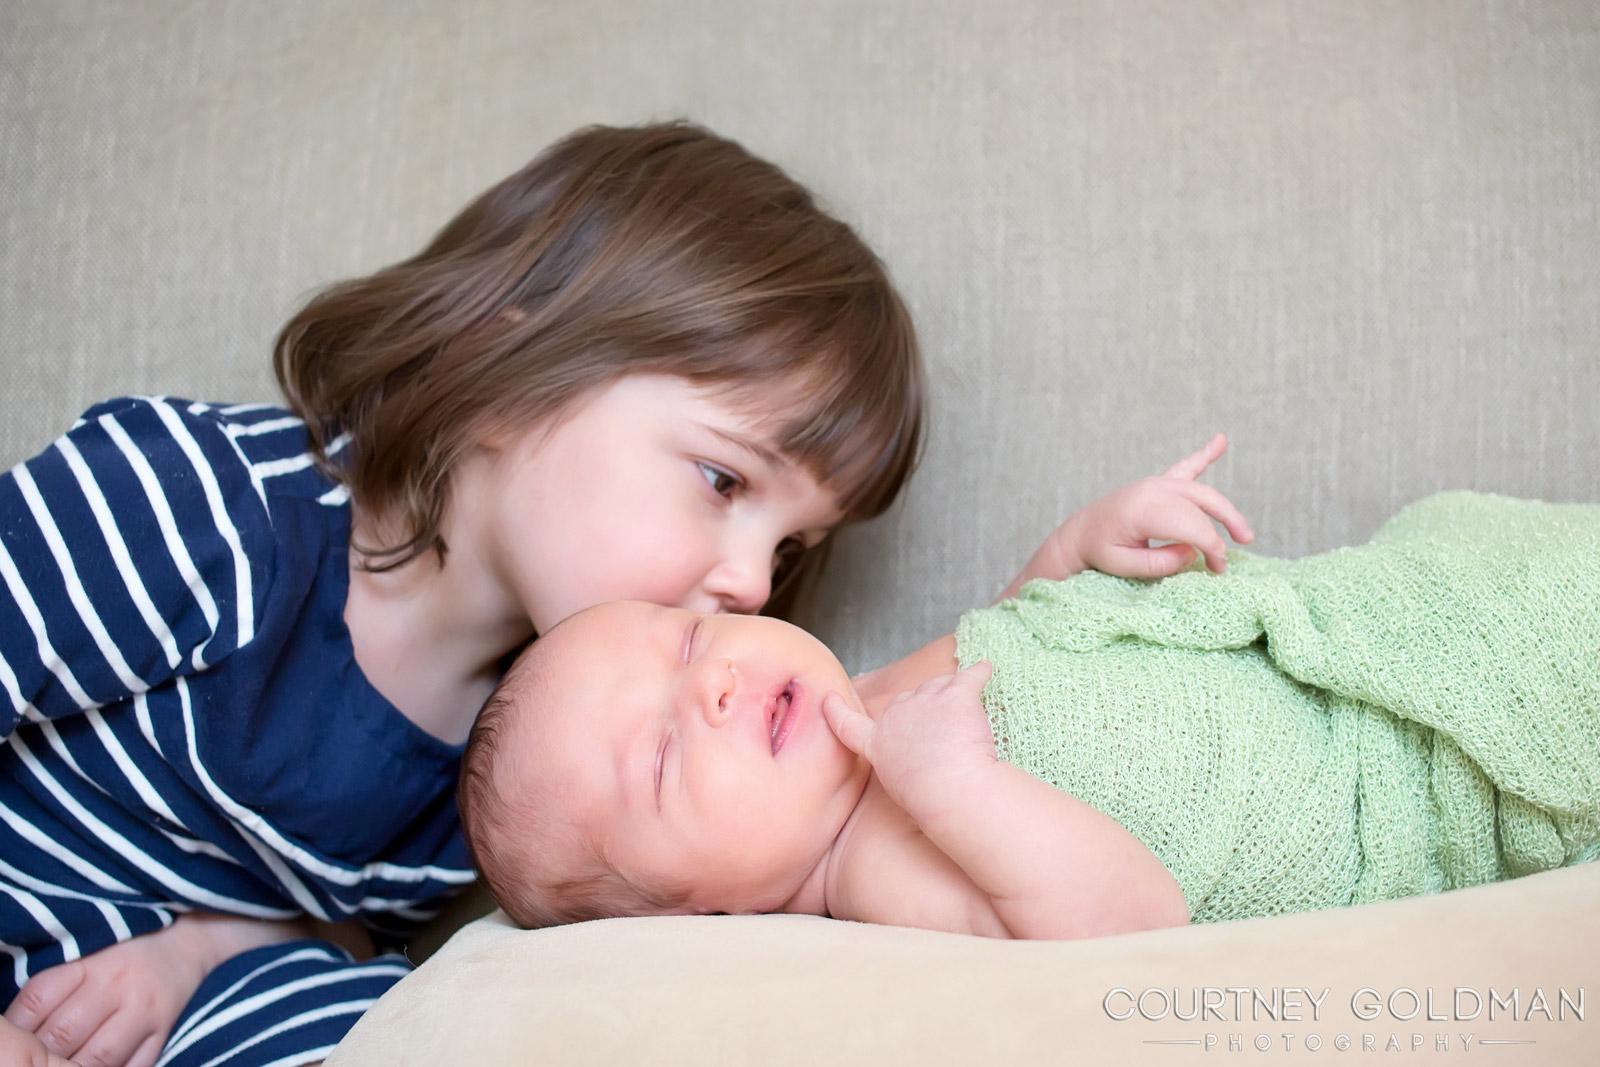 Atlanta Maternity and Newborn Photography by Courtney Goldman 40.jpg